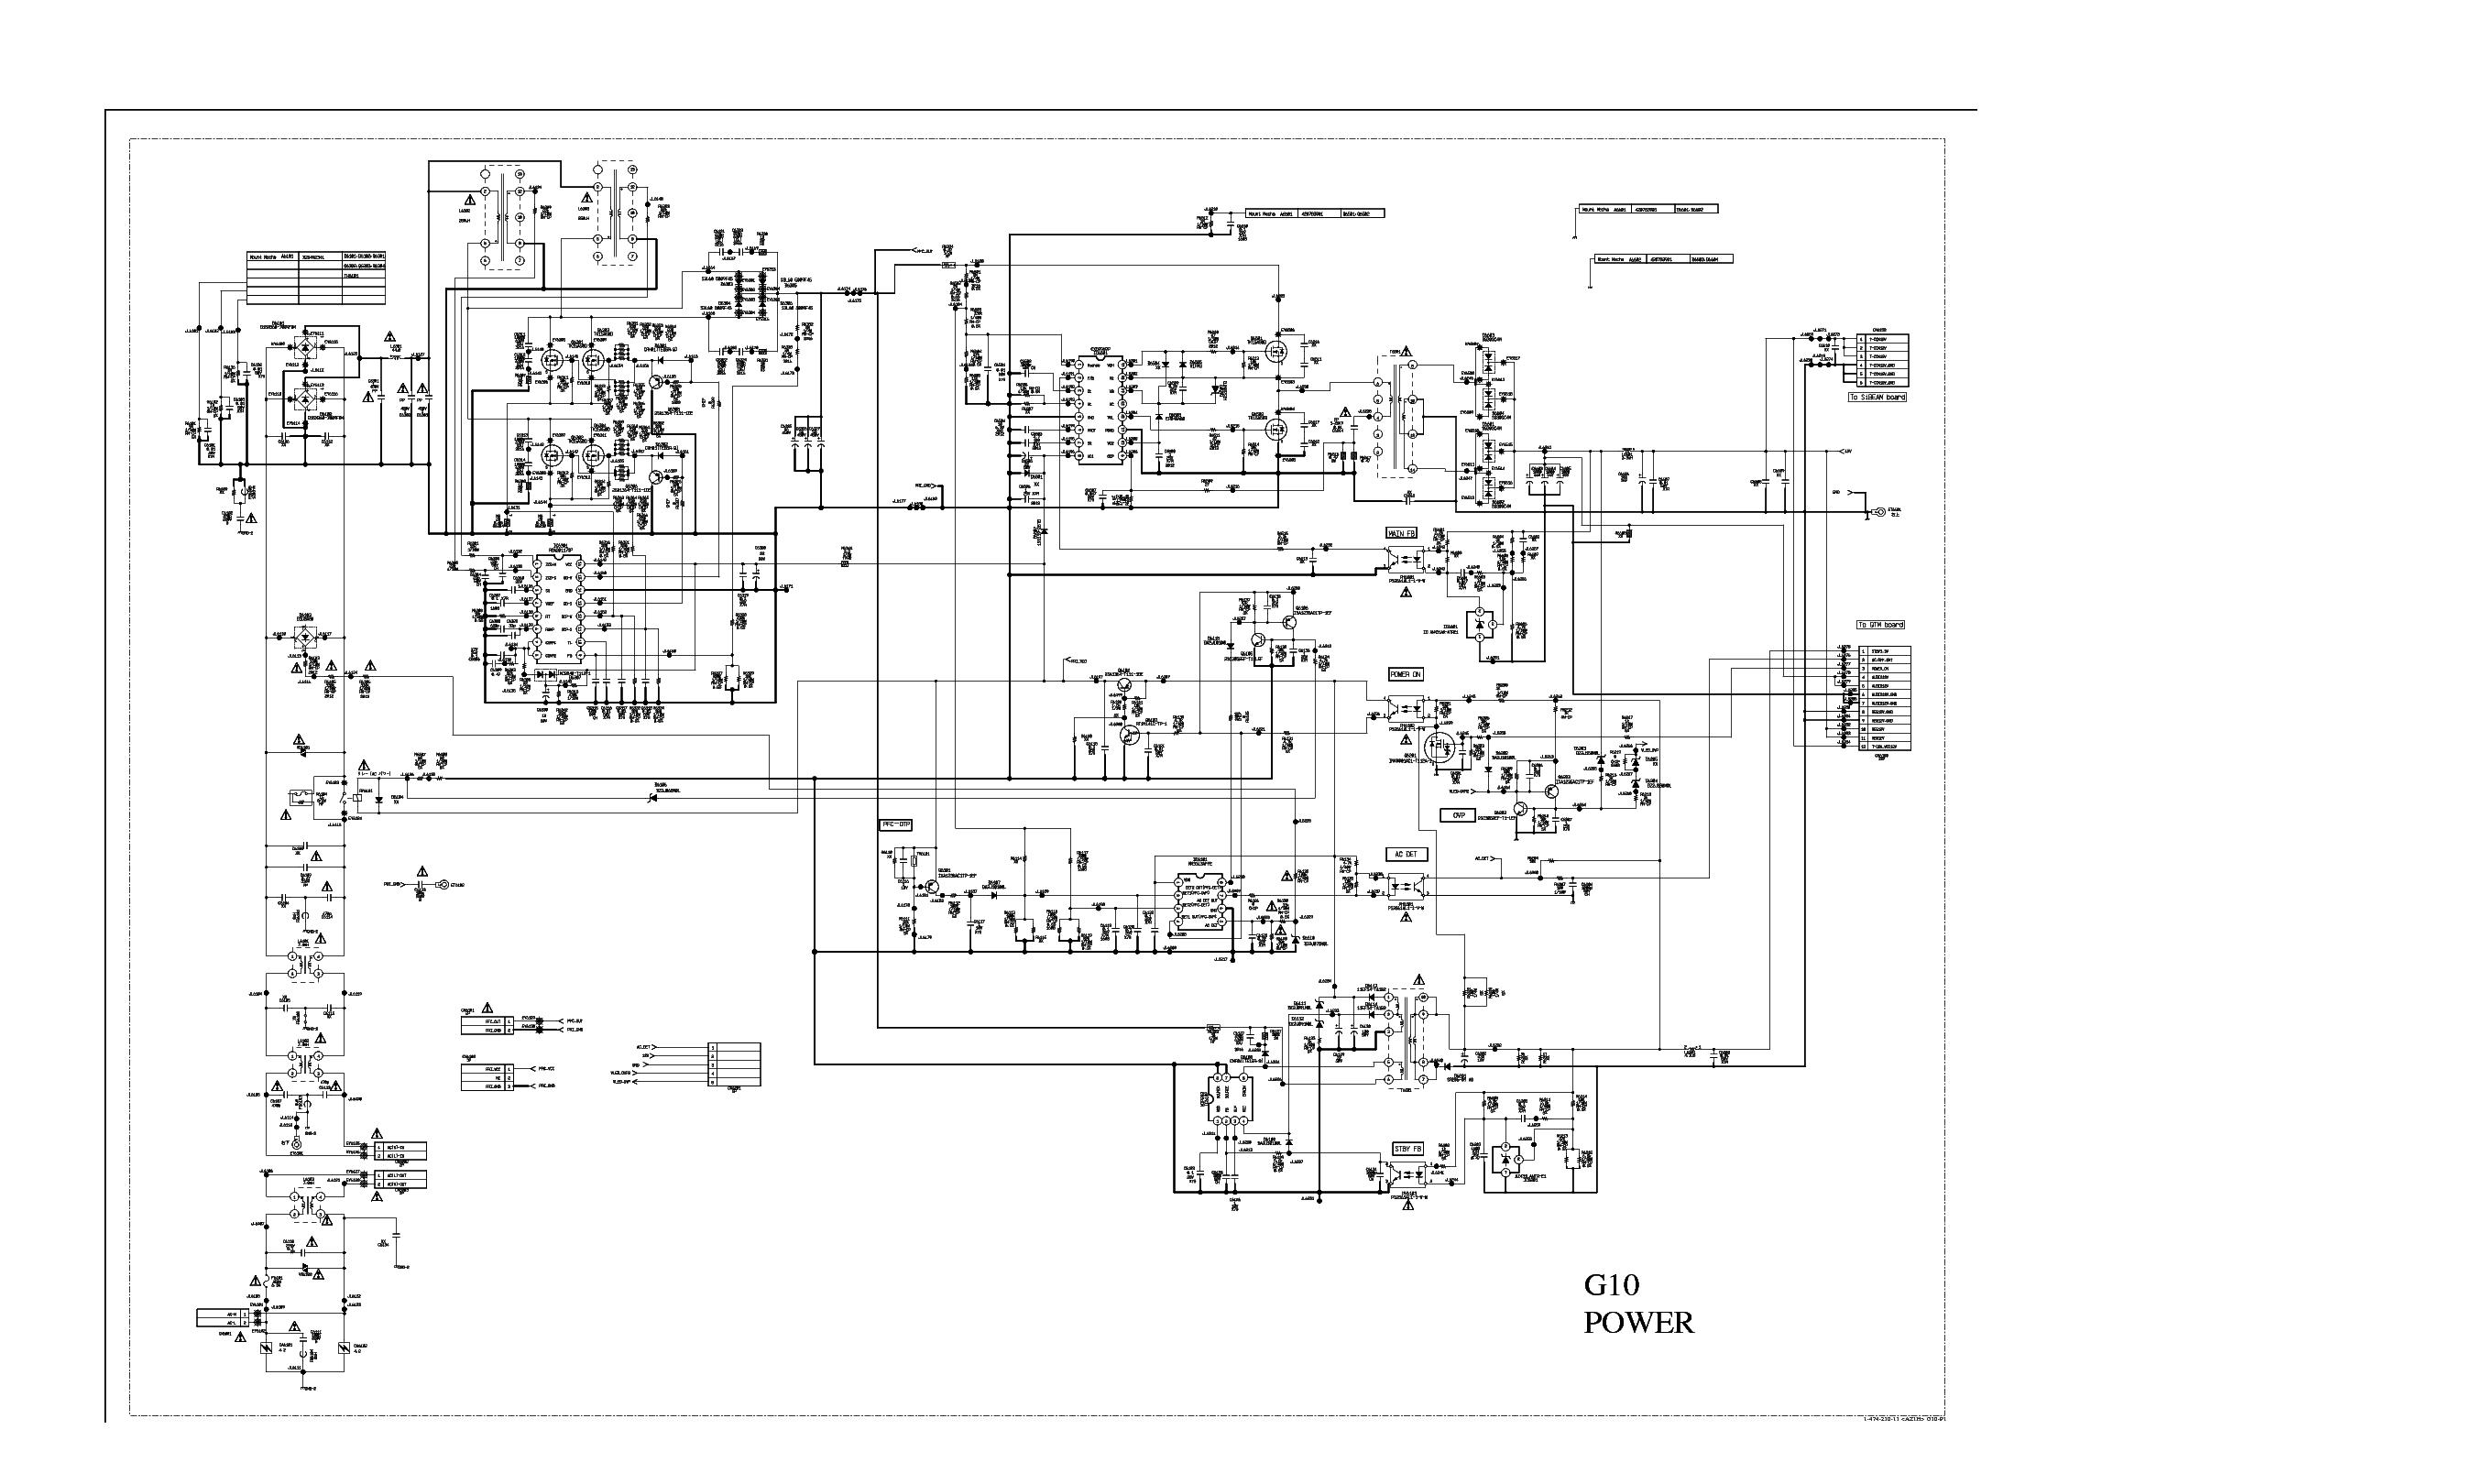 Sony G10 Aps